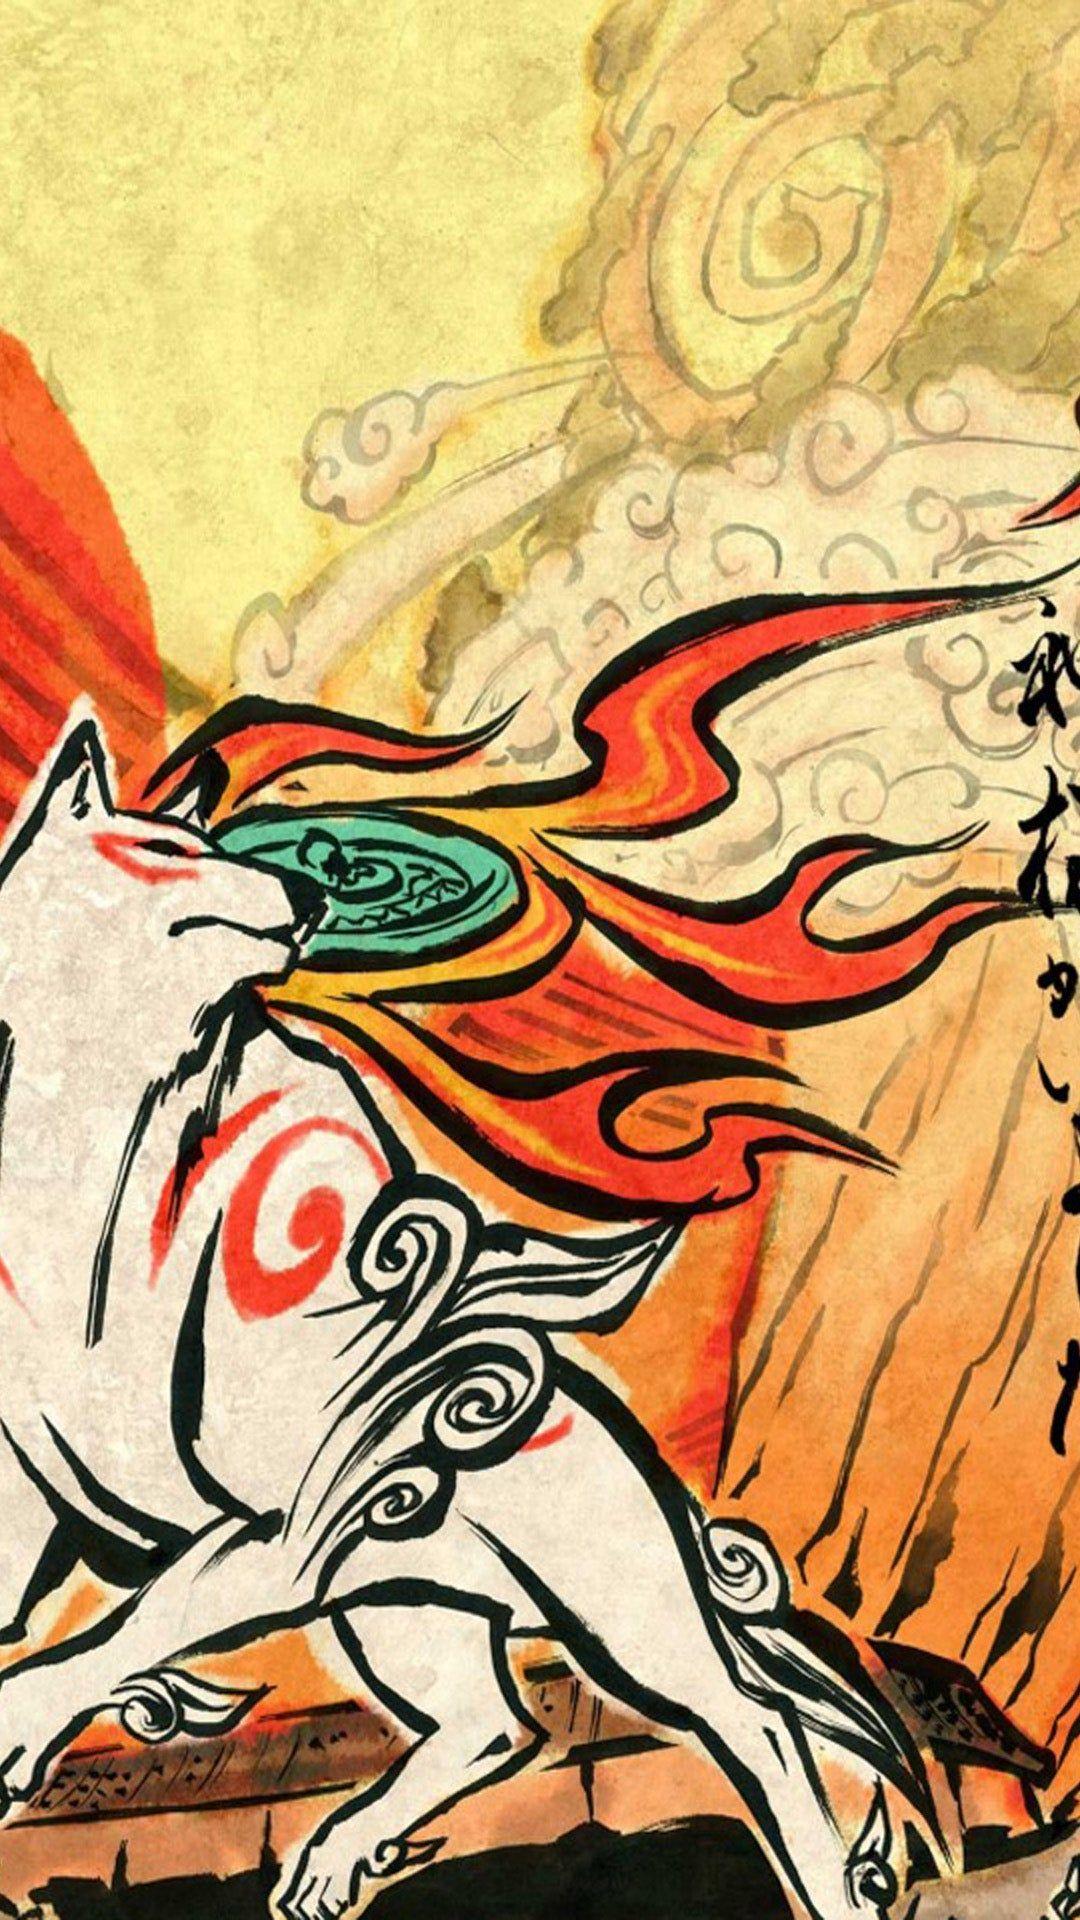 Okami 1920x1080 Okami Movie Wallpapers Japanese Mythology